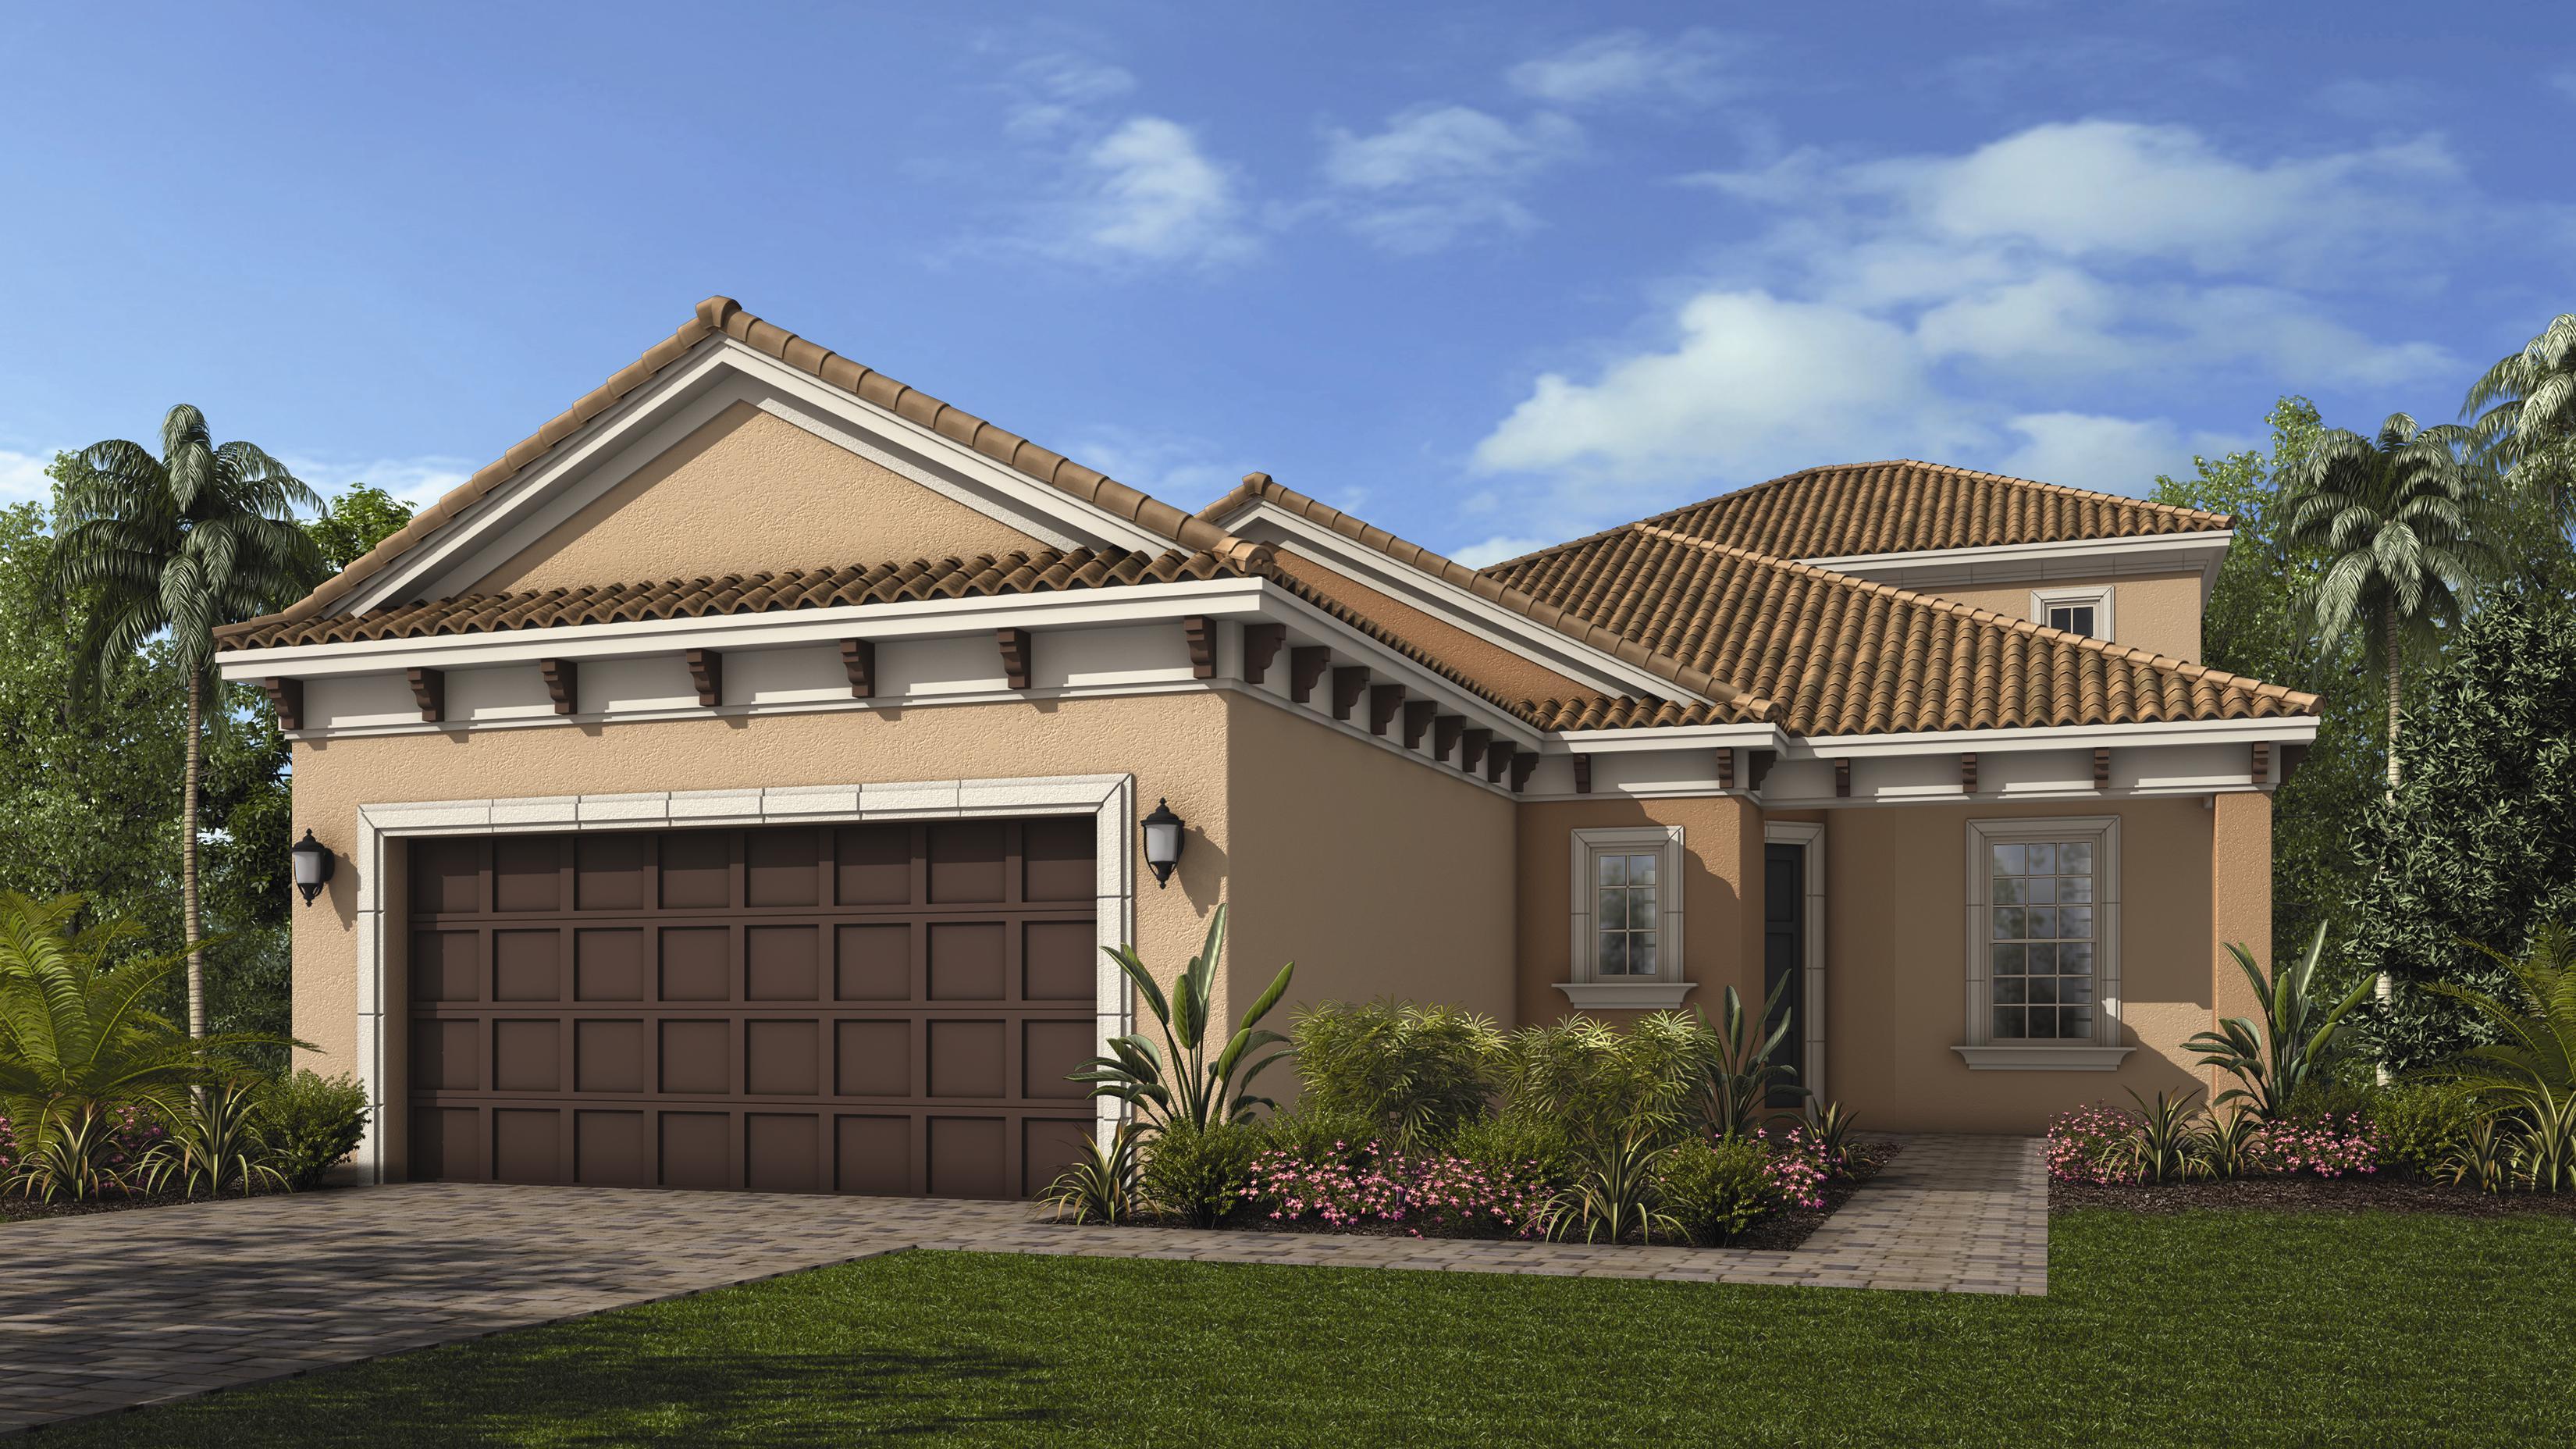 Single Family for Sale at Esplanade At Hacienda Lakes - Trevi 8603 Magglore Court Naples, Florida 34114 United States